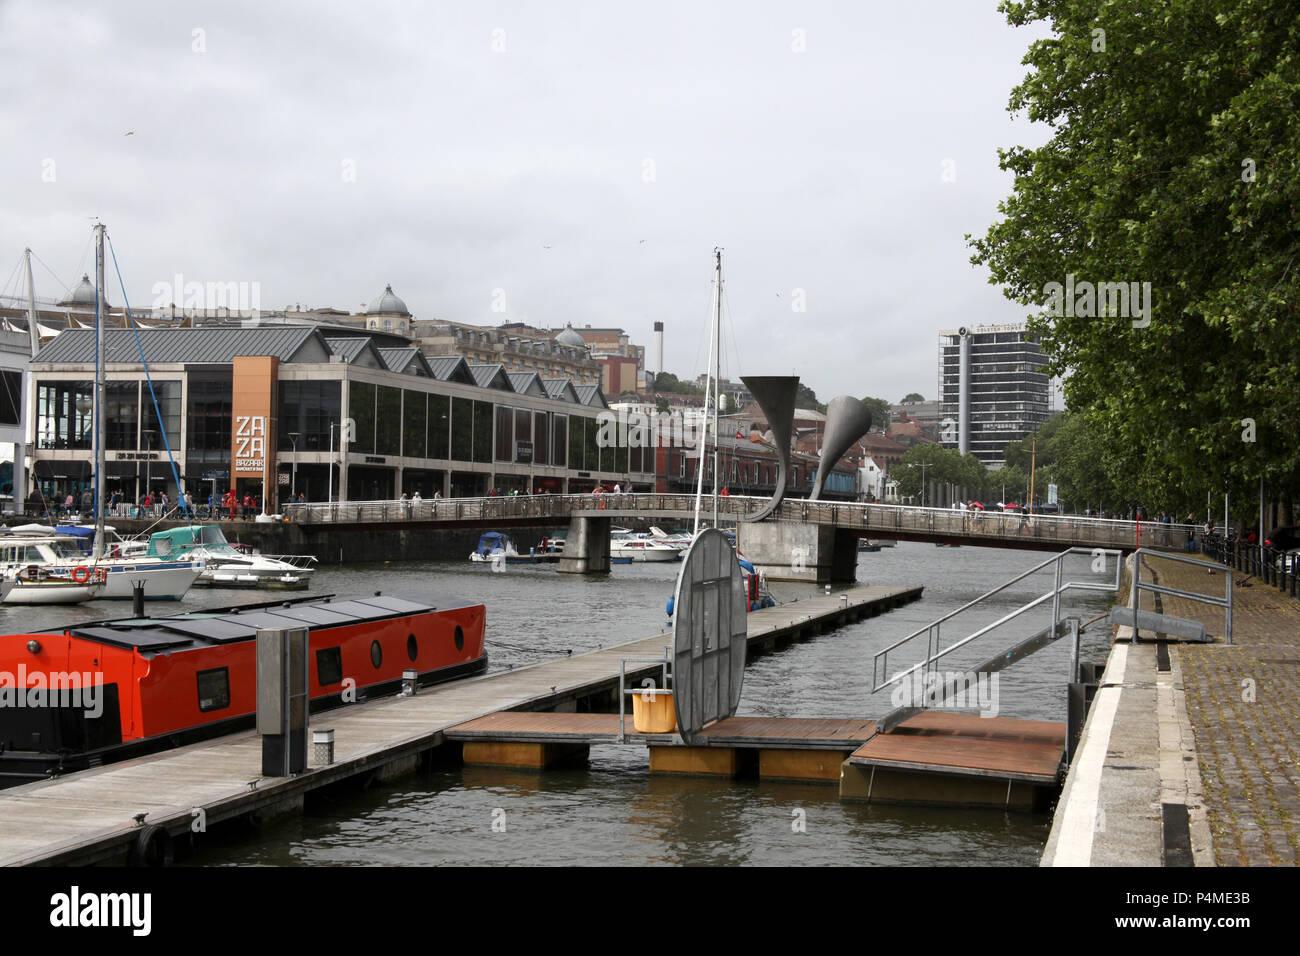 Harbourside and Pero's Bridge in Bristol, England. - Stock Image